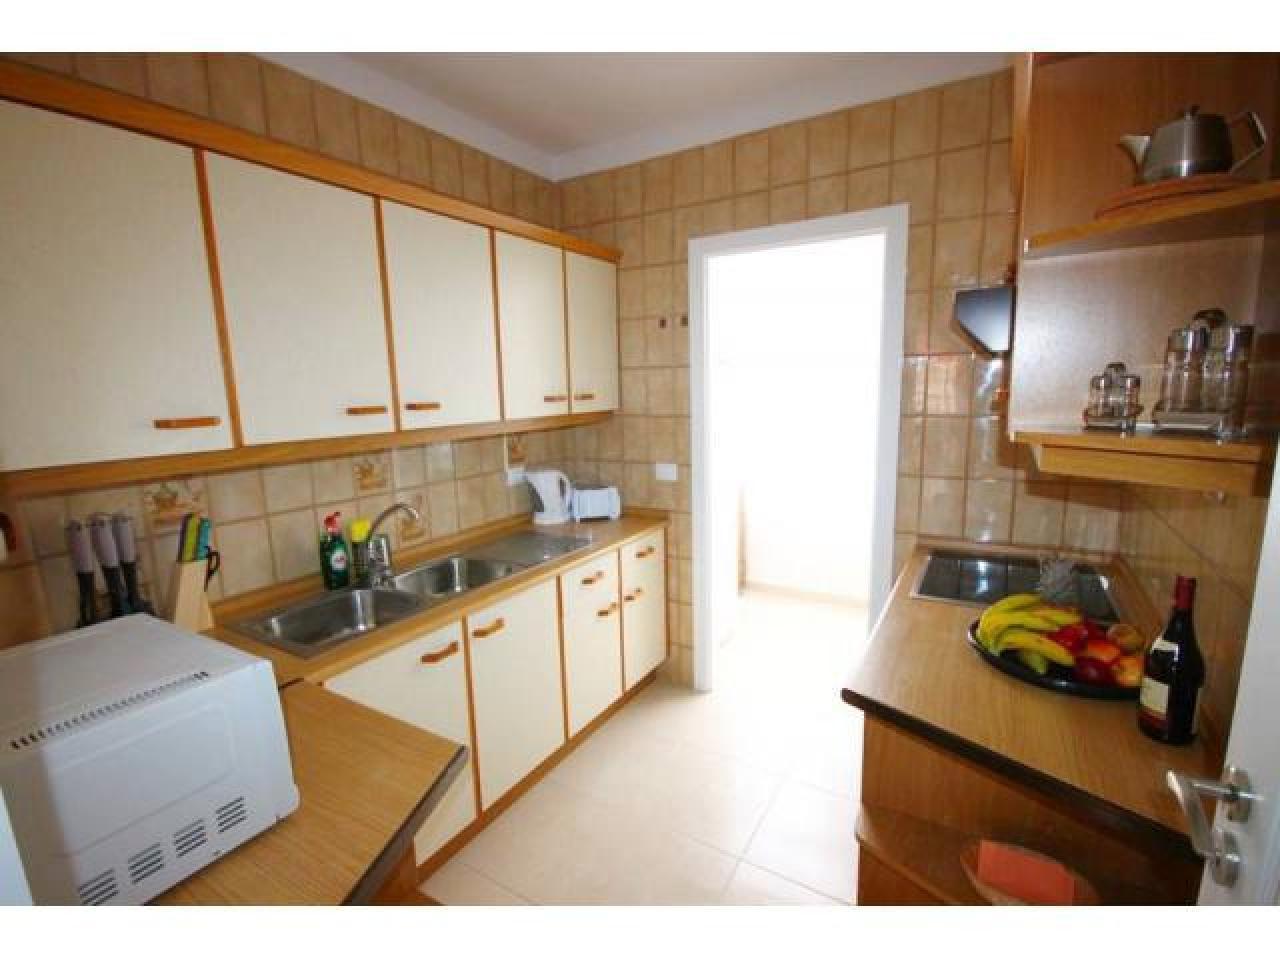 Apartment in Tenerife for rent - 2